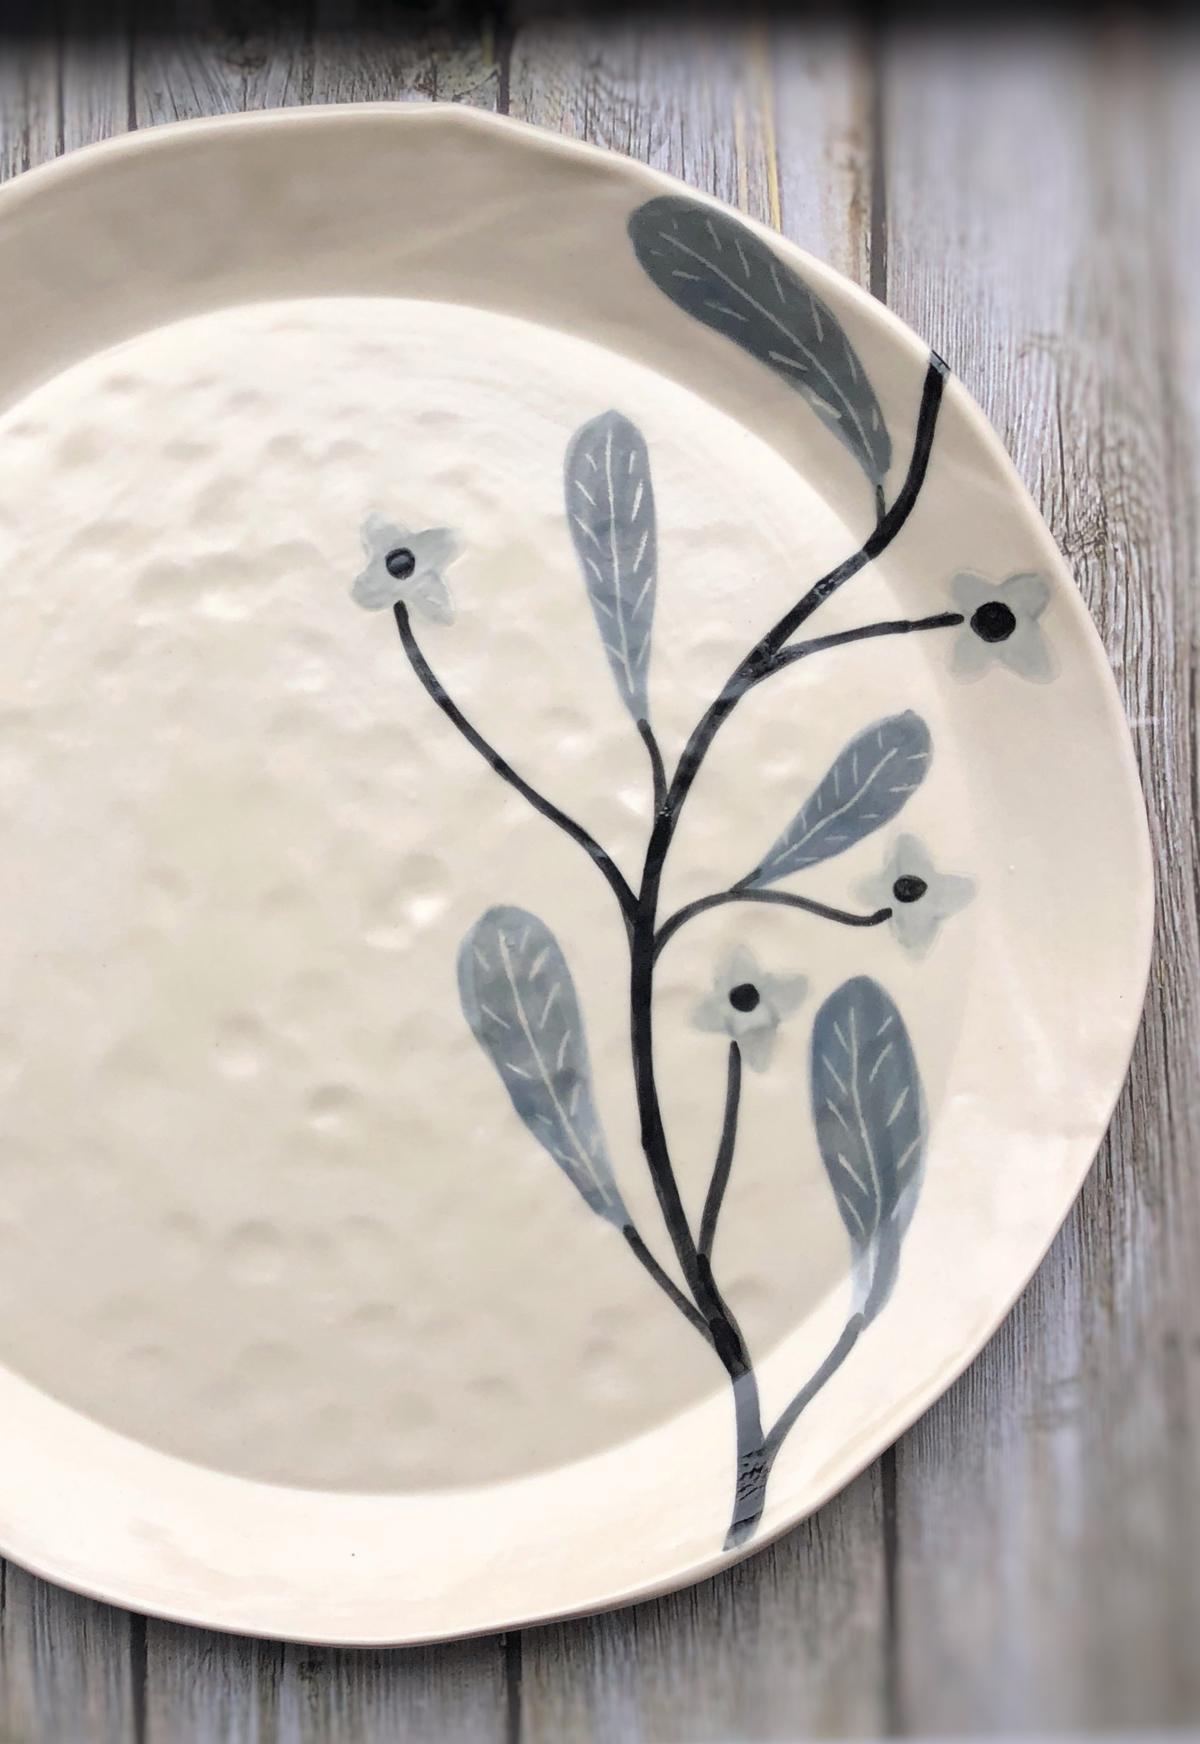 Gabrielle_schaffner-dinner-plate-grey-flowers.jpg